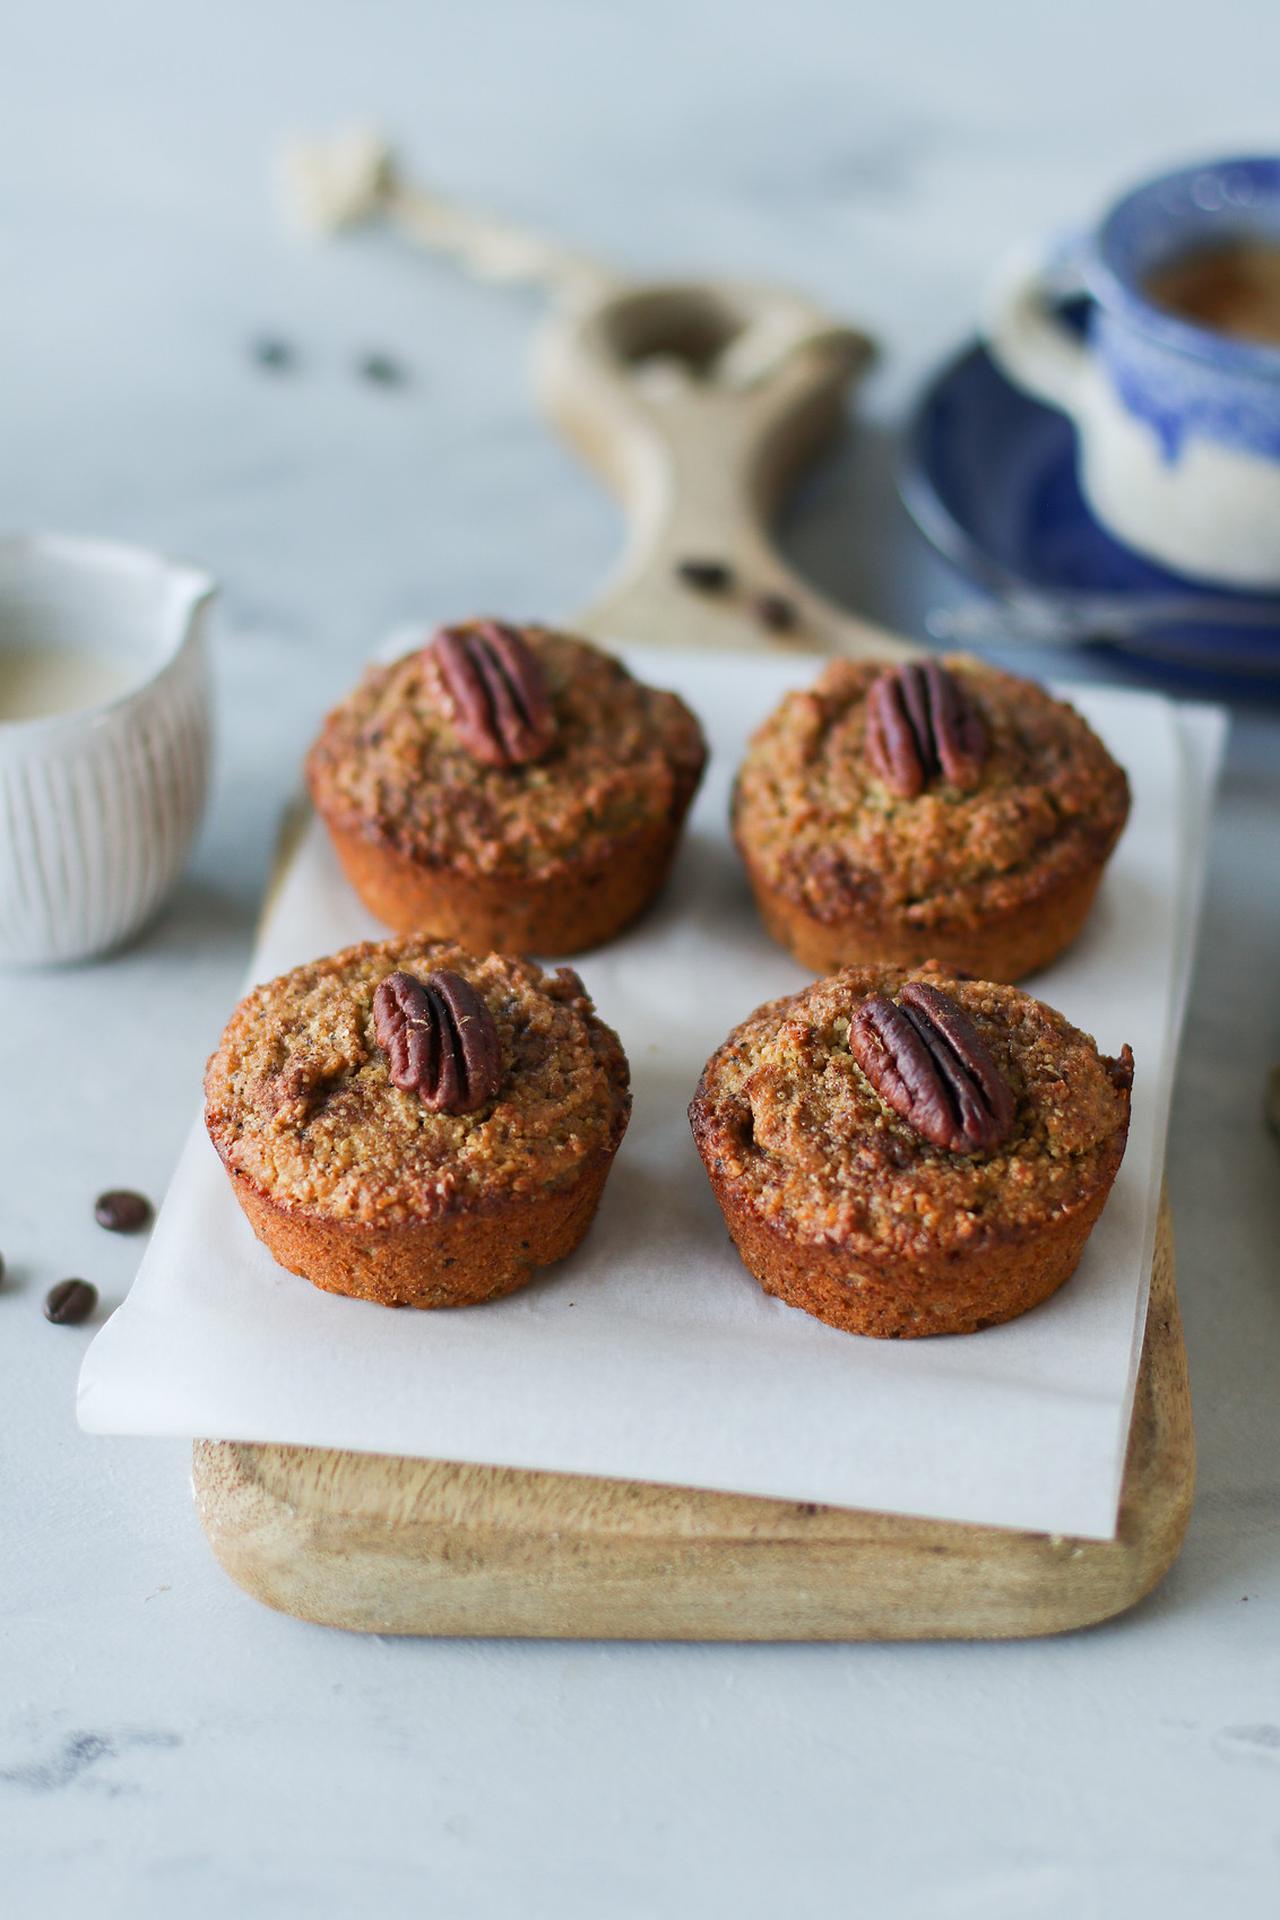 Main image of Banana Coffee Muffins